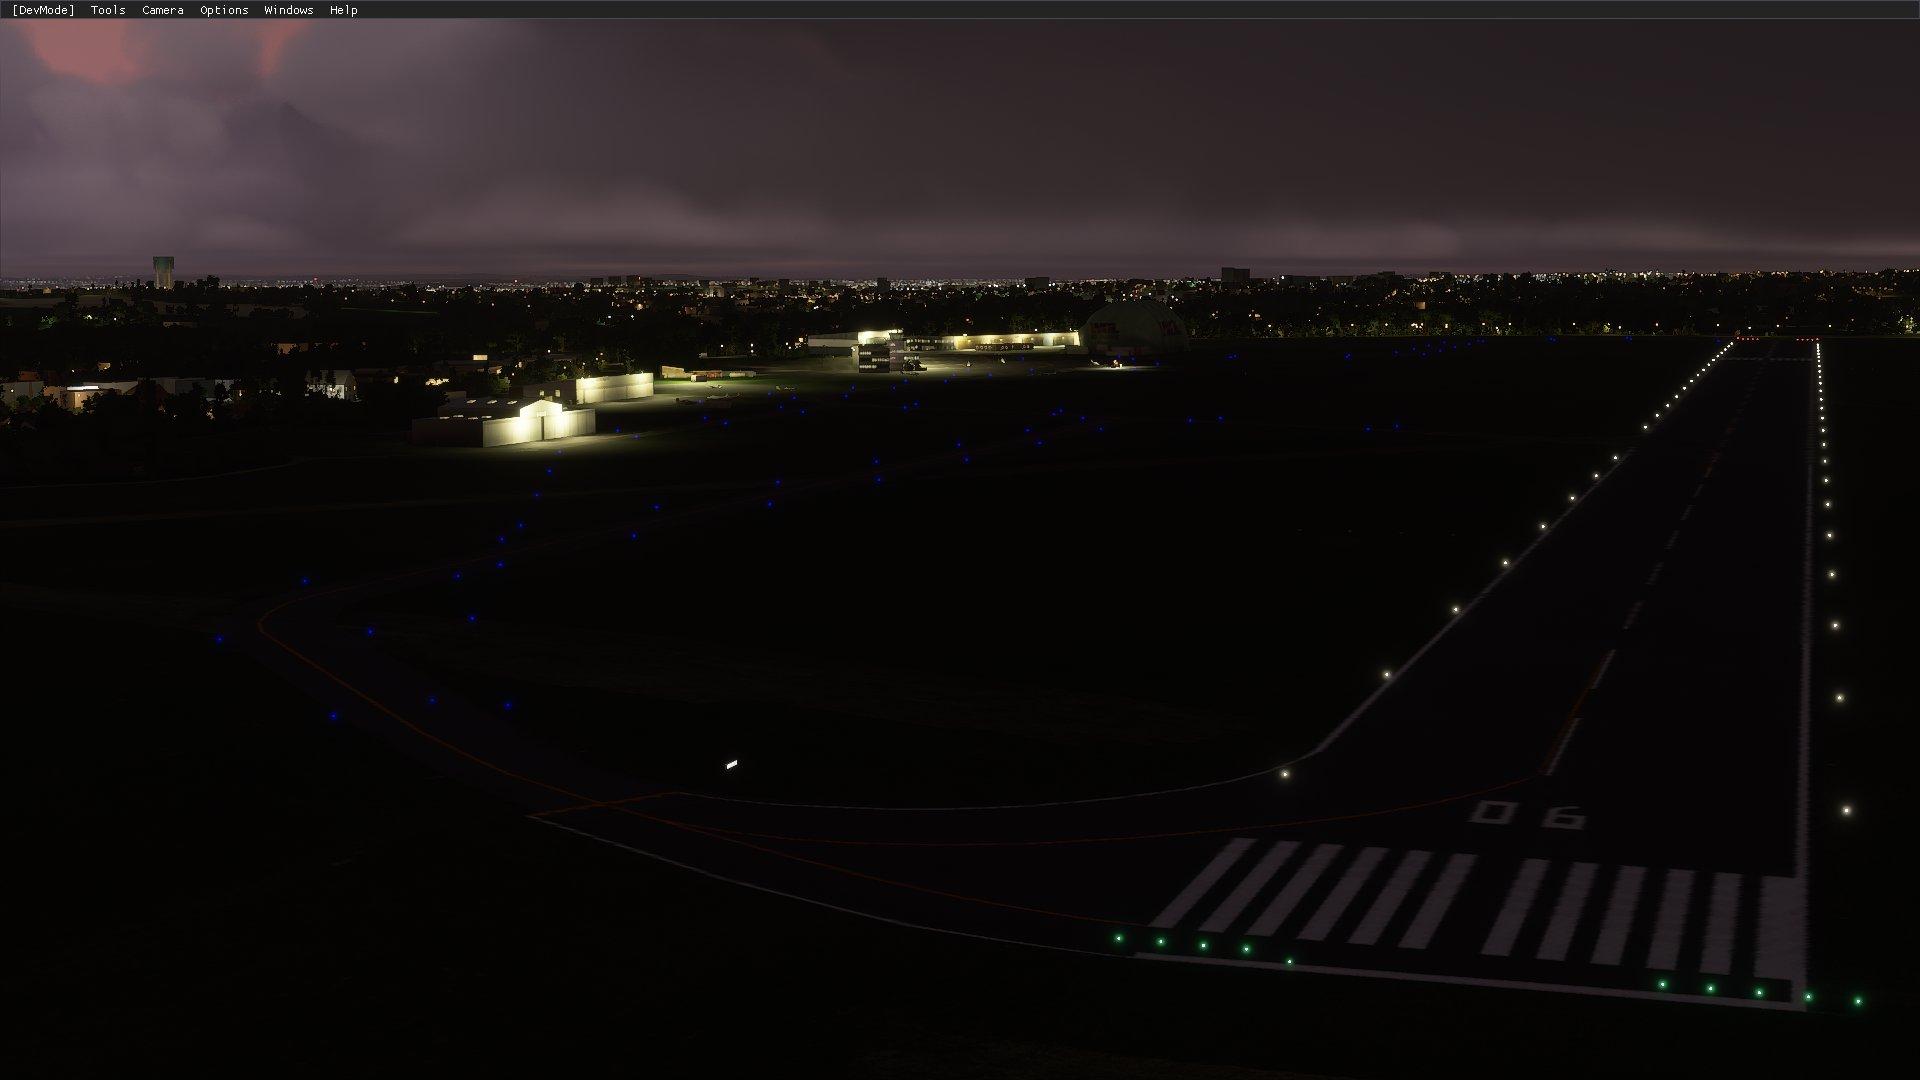 mfs_bahrometrix_edle_night_lights_2.jpg